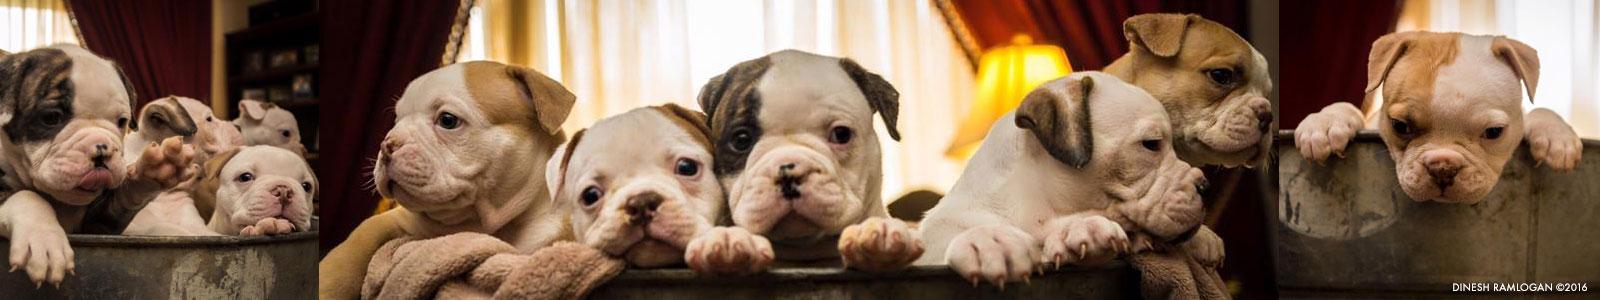 American Bulldogs - American Bulldog Puppies - Bulldogs